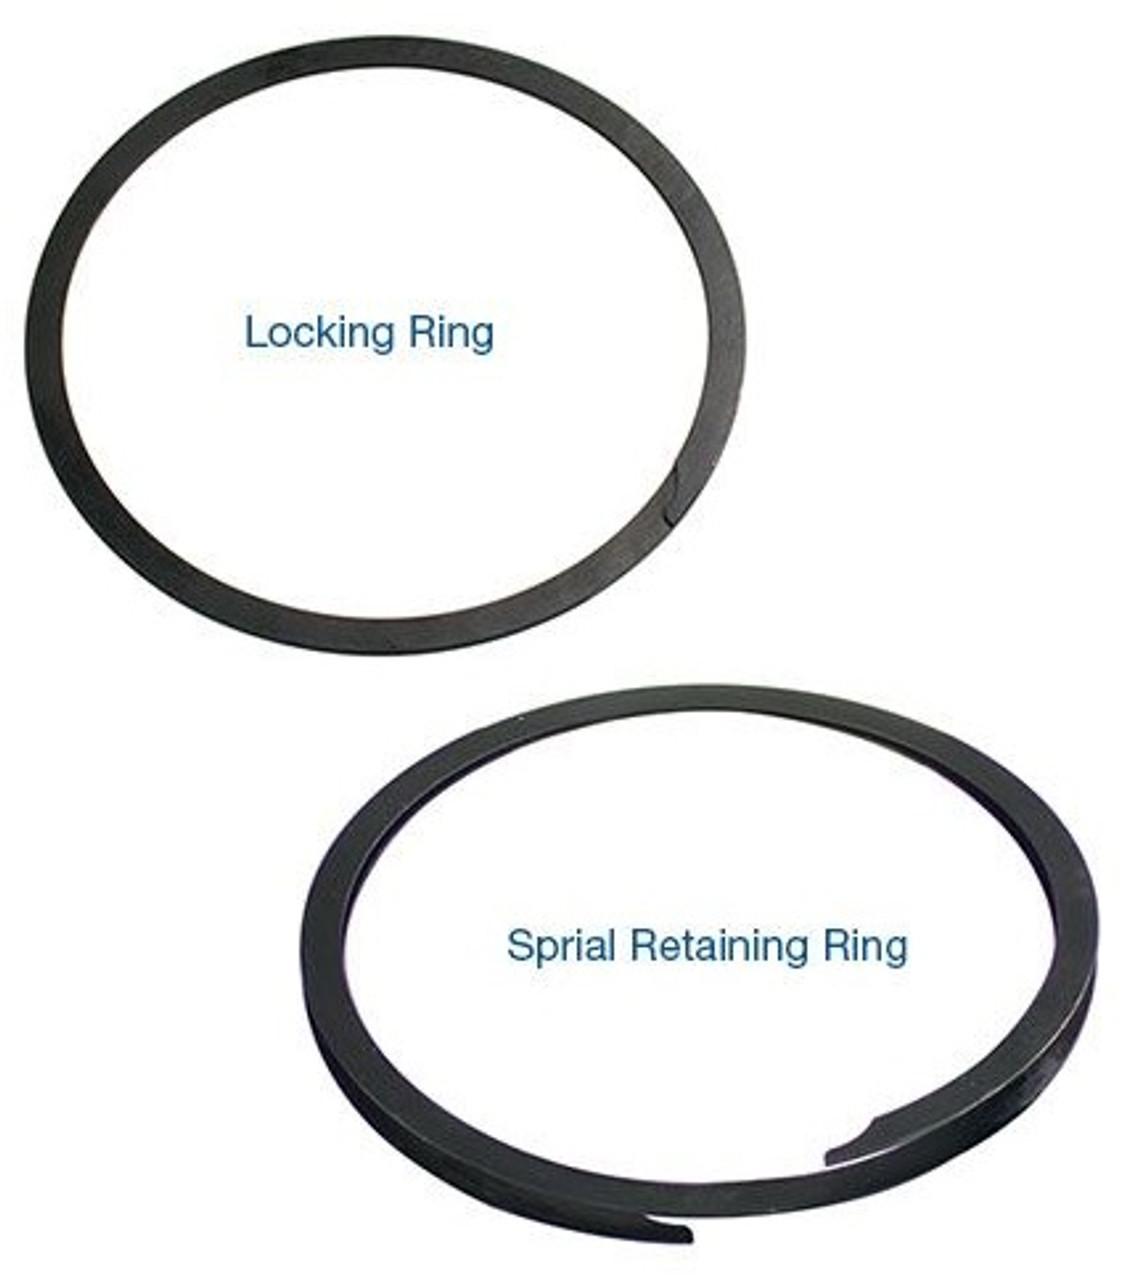 4R70W 4R75W AOD AODE Transmission Sonnax Spiral Retaining Ring Kit